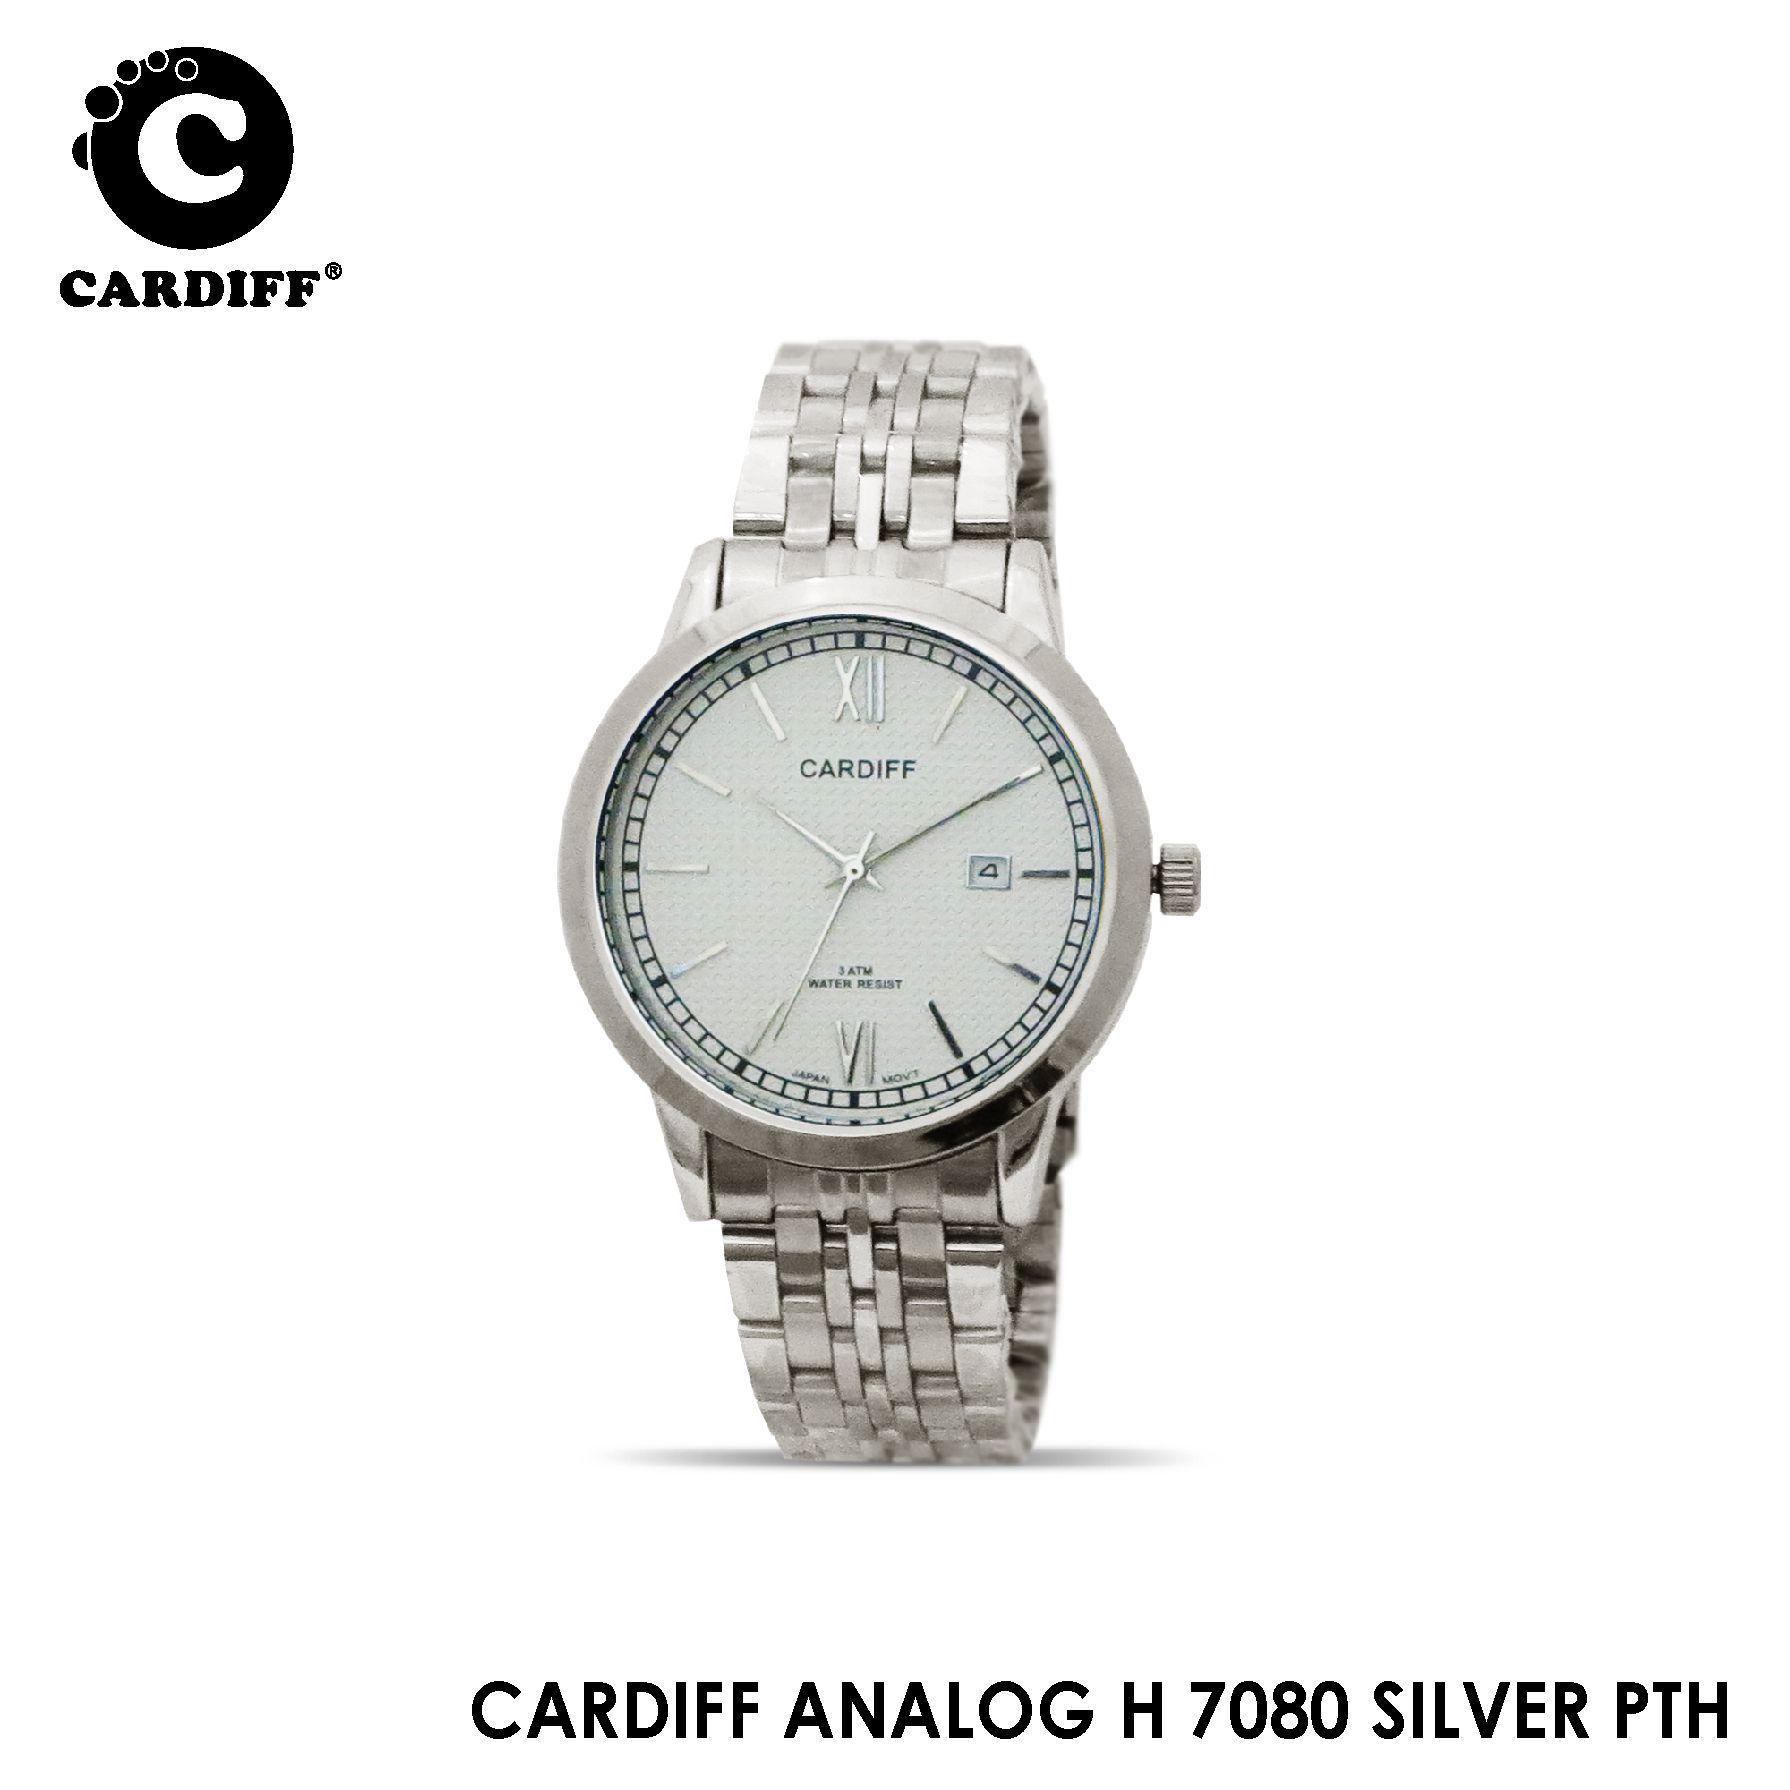 Cardiff Analog H 7080